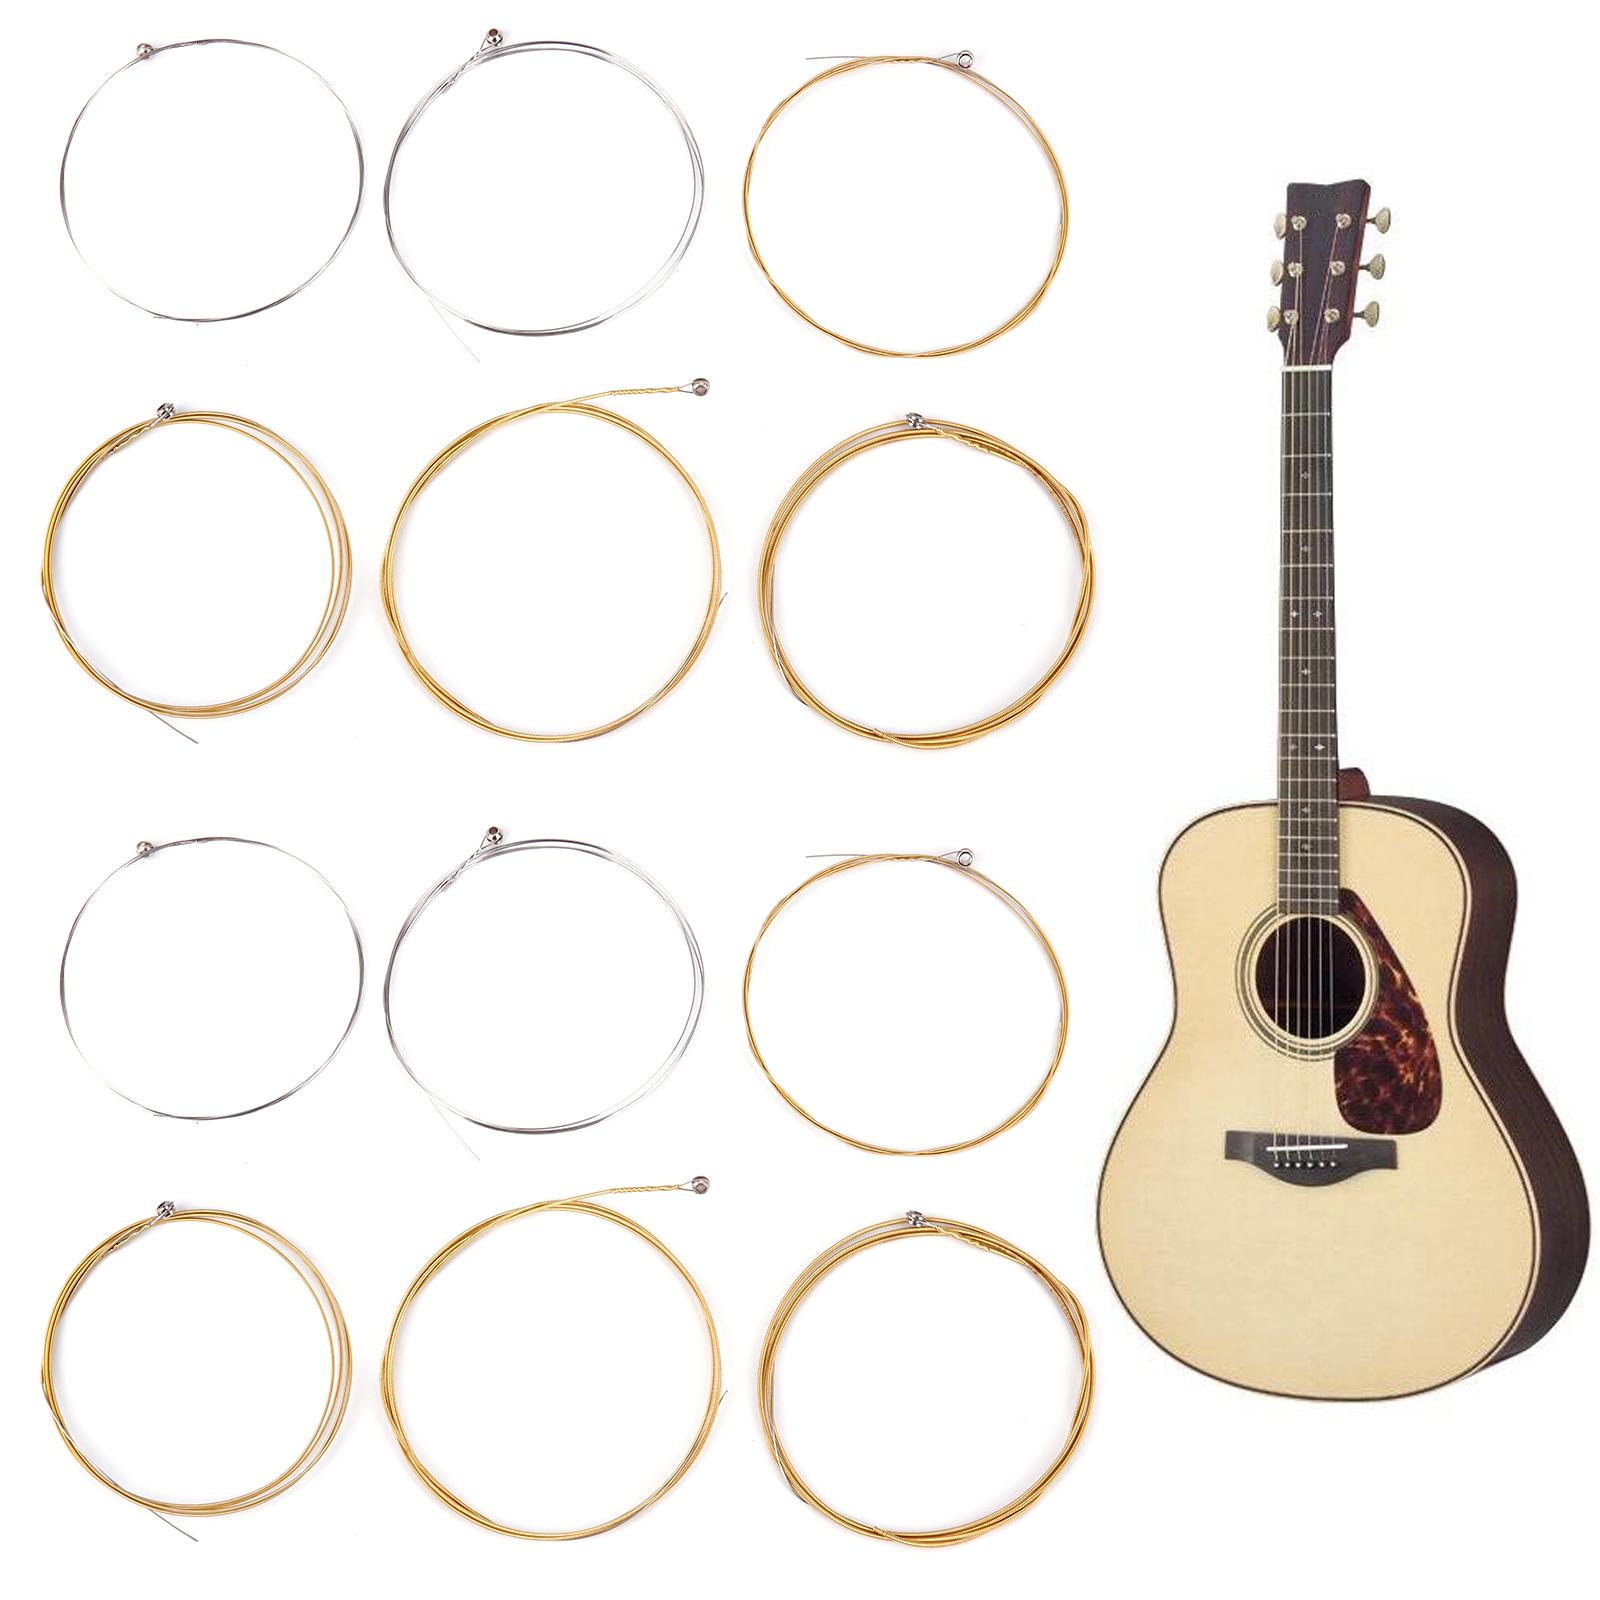 12 pcs acoustic guitar steel strings gauge accessories replacements ebay. Black Bedroom Furniture Sets. Home Design Ideas